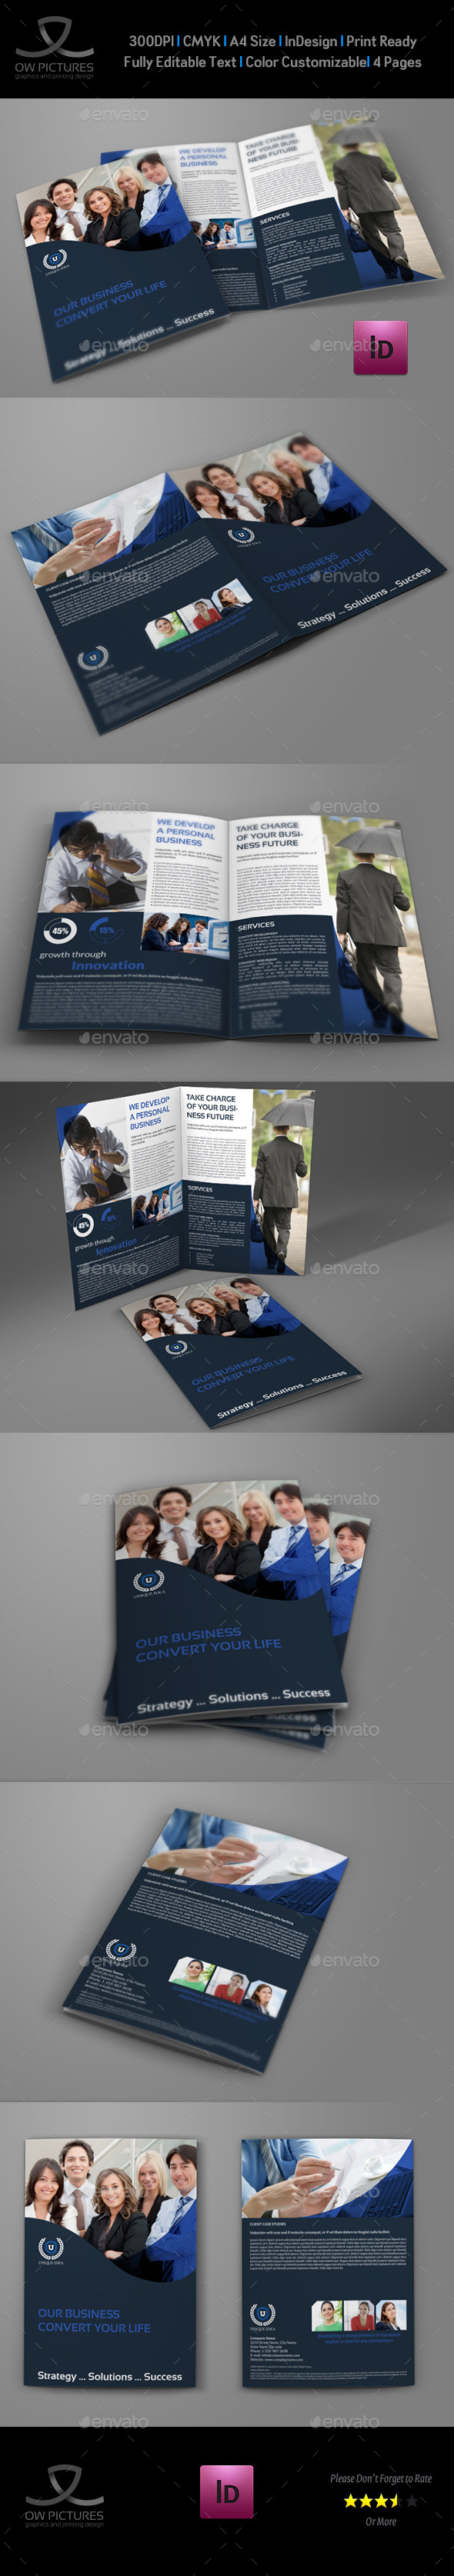 Company Brochure Bi-Fold Template Vol.36 - Corporate Brochures